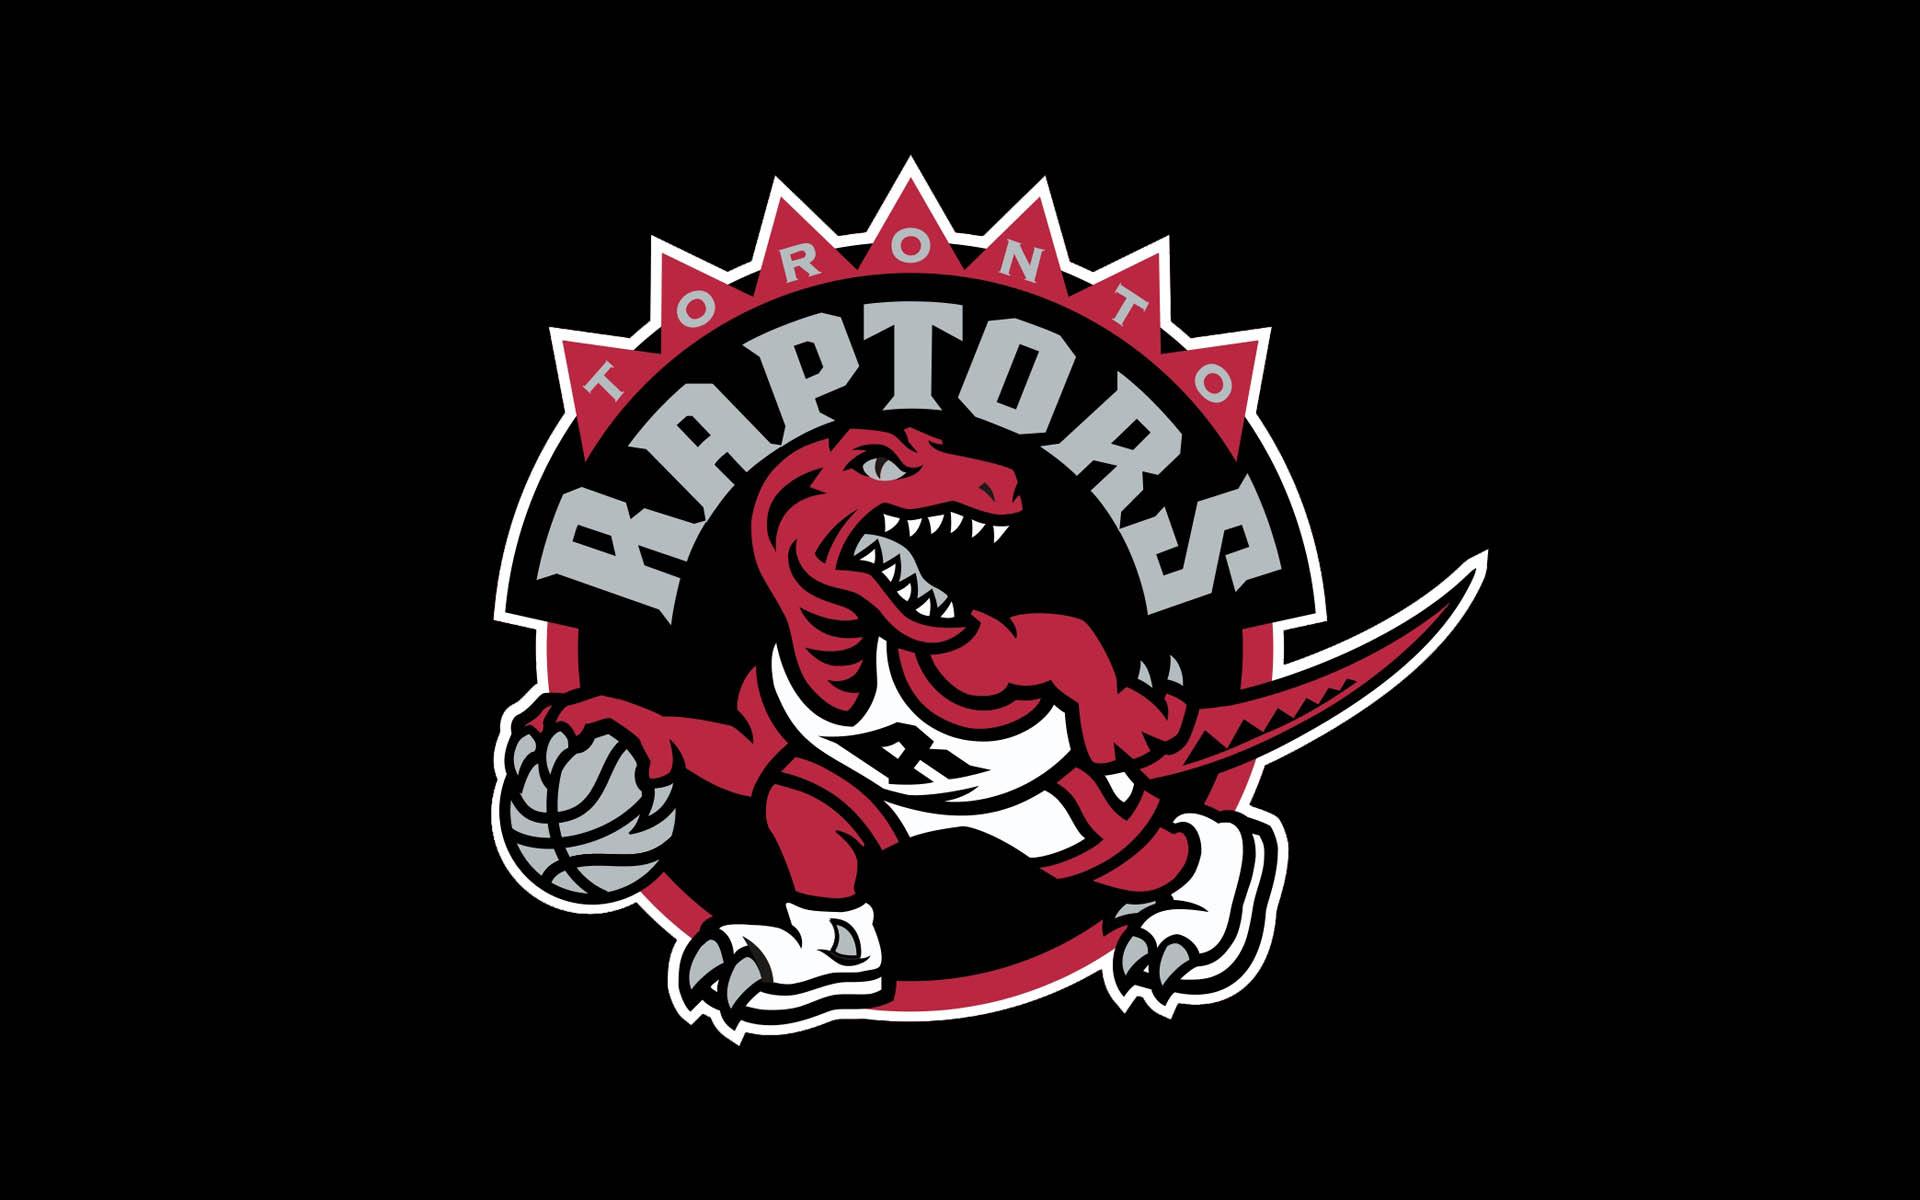 Toronto Raptors Wallpaper 1920x1200